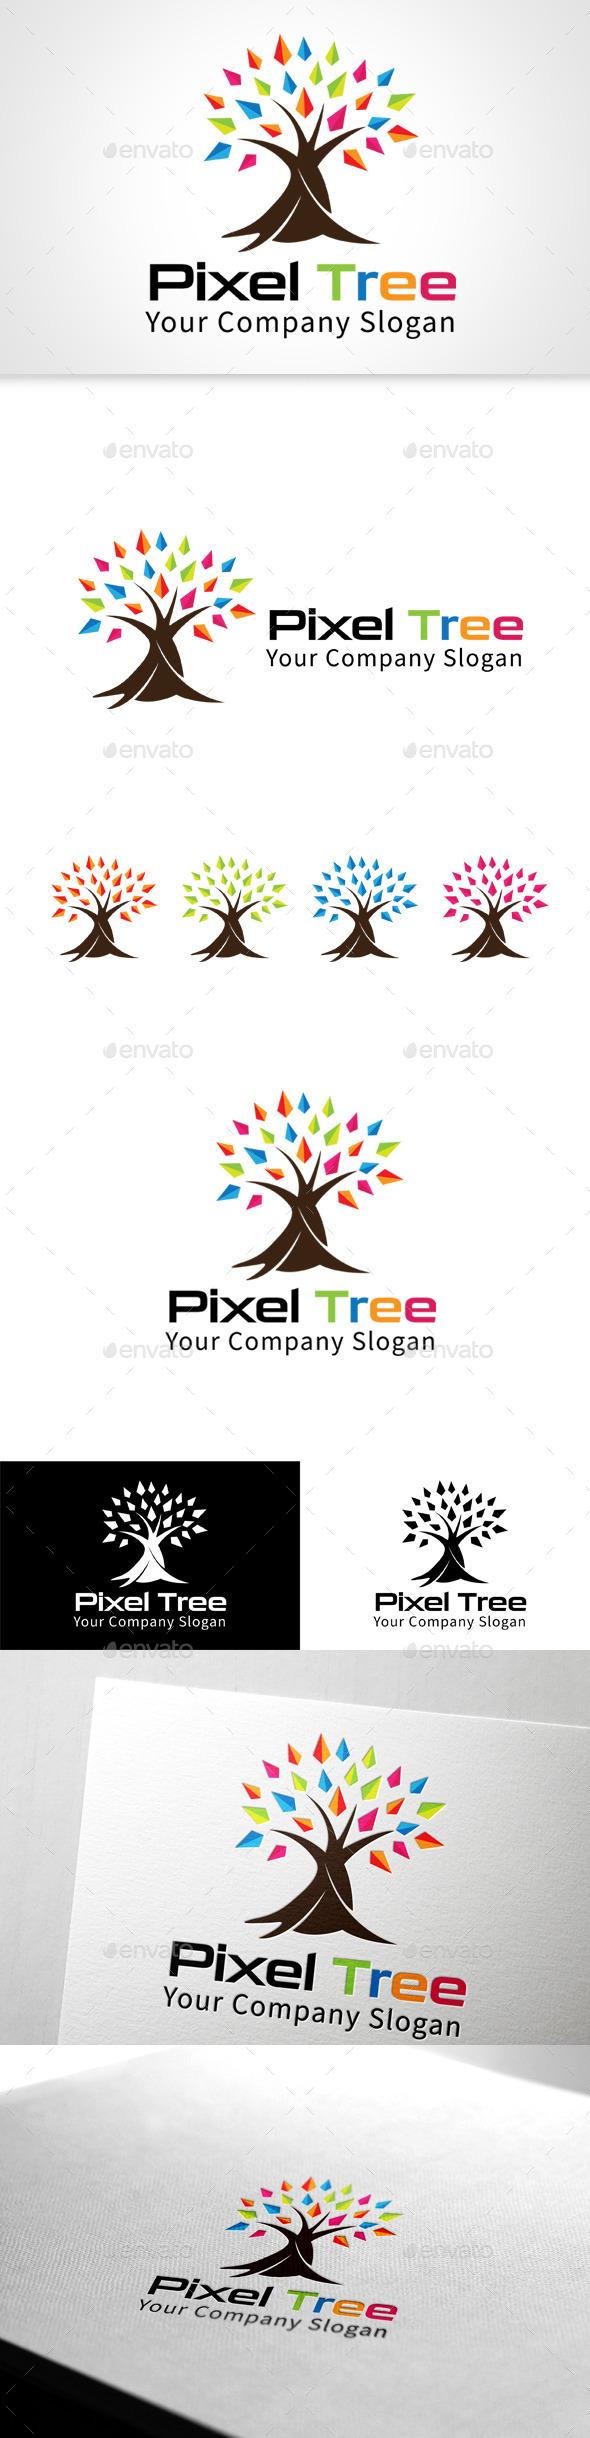 GraphicRiver Pixal Tree Logo 11506701